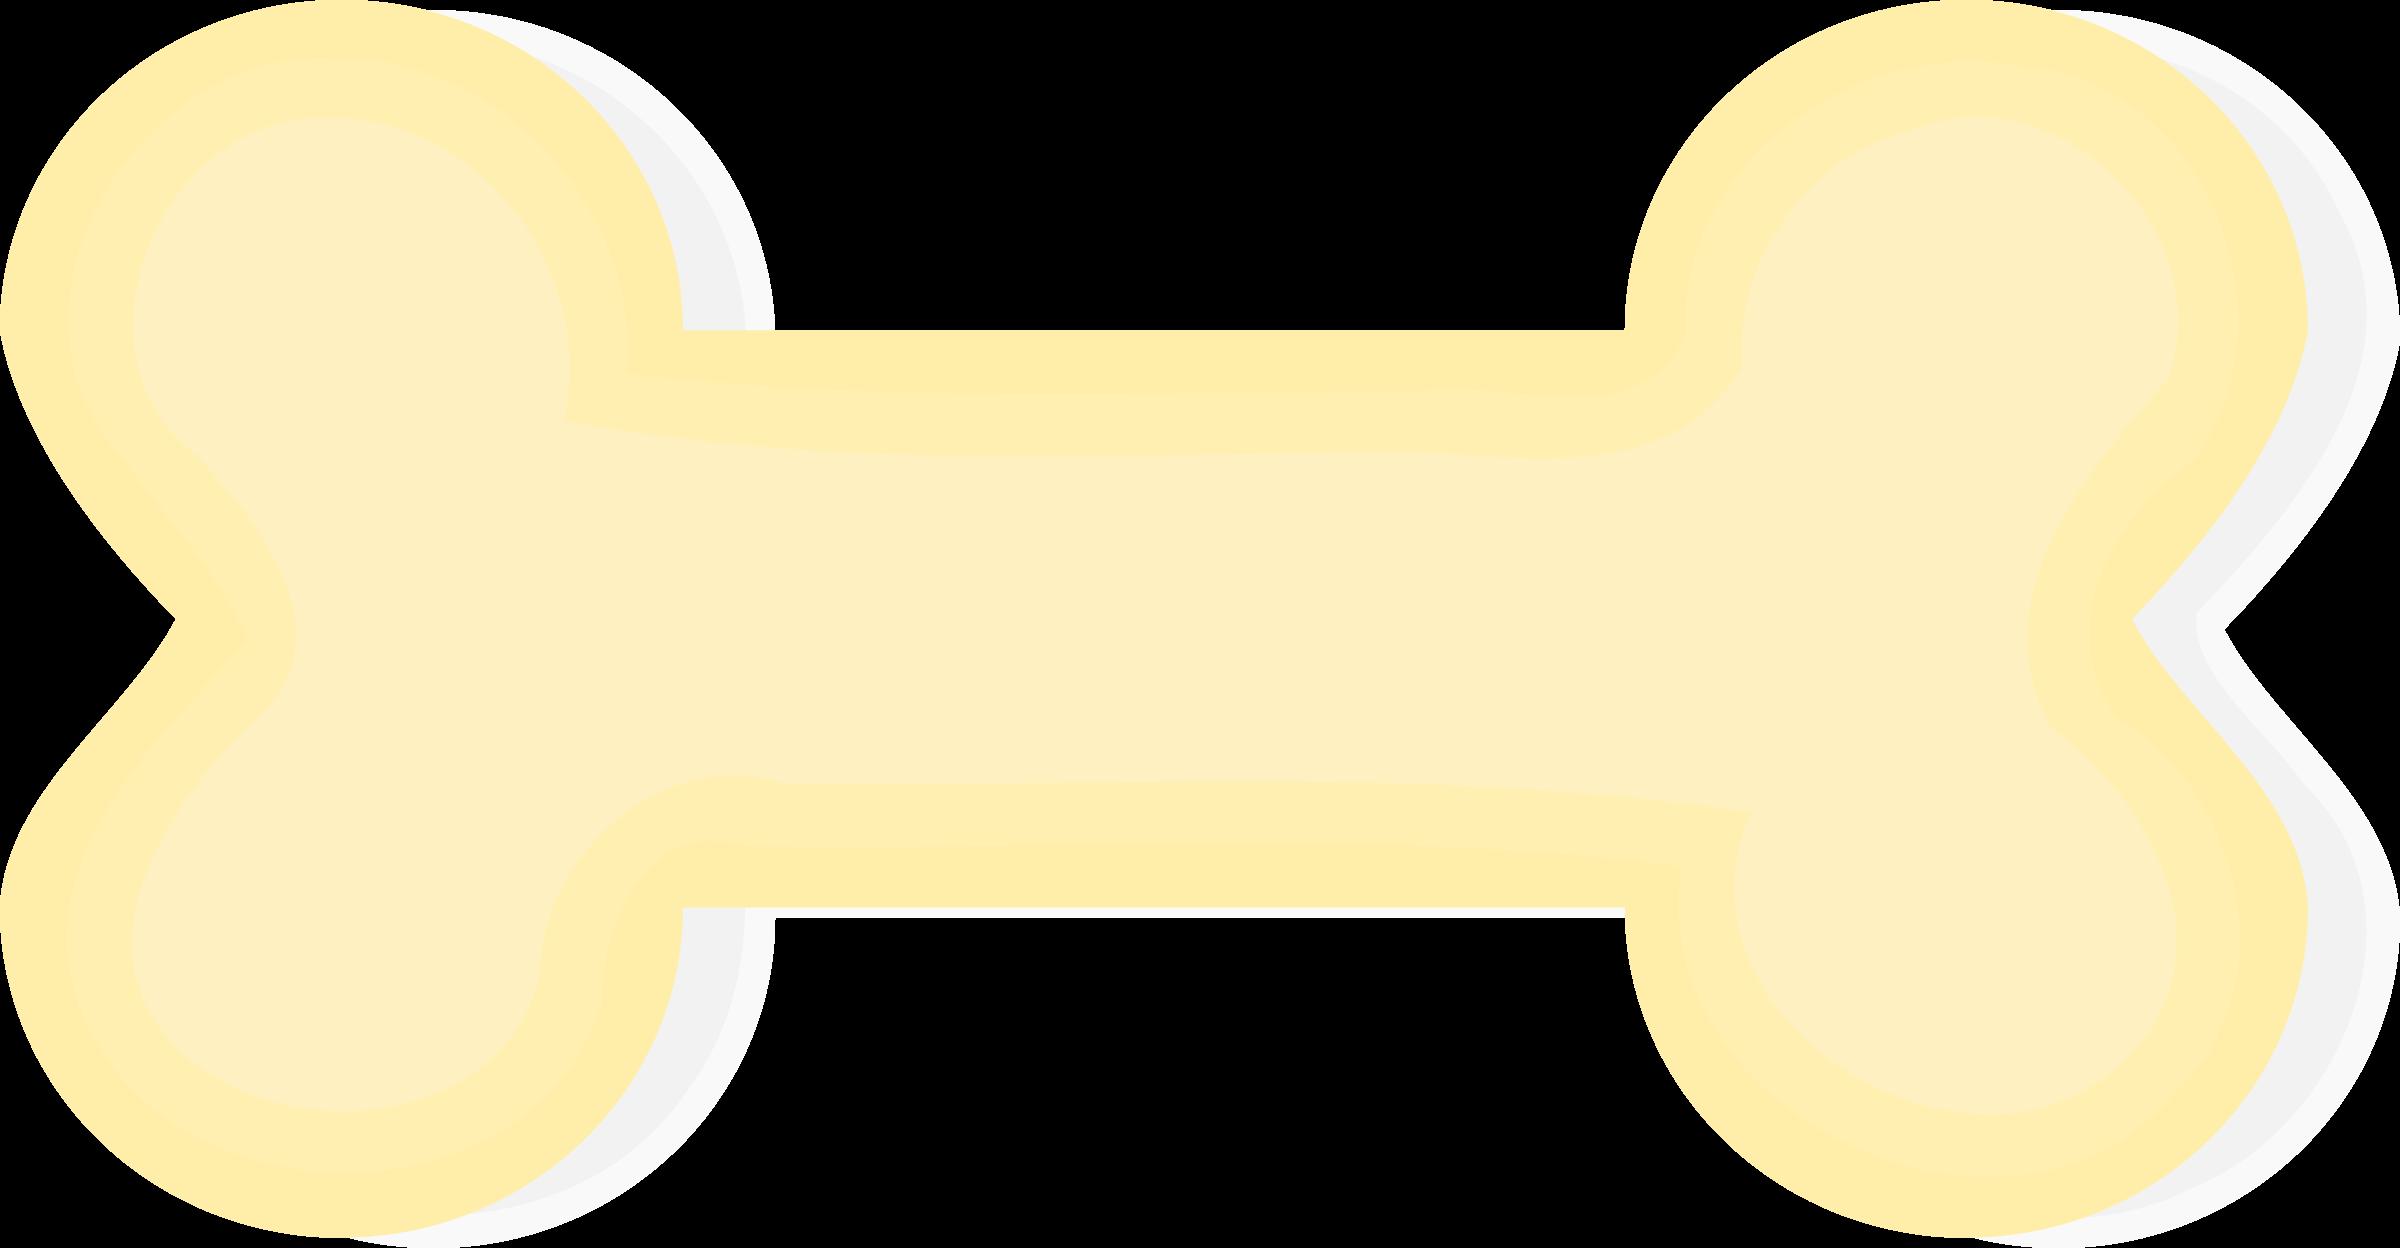 2400x1248 Clipart Dog Bone Image